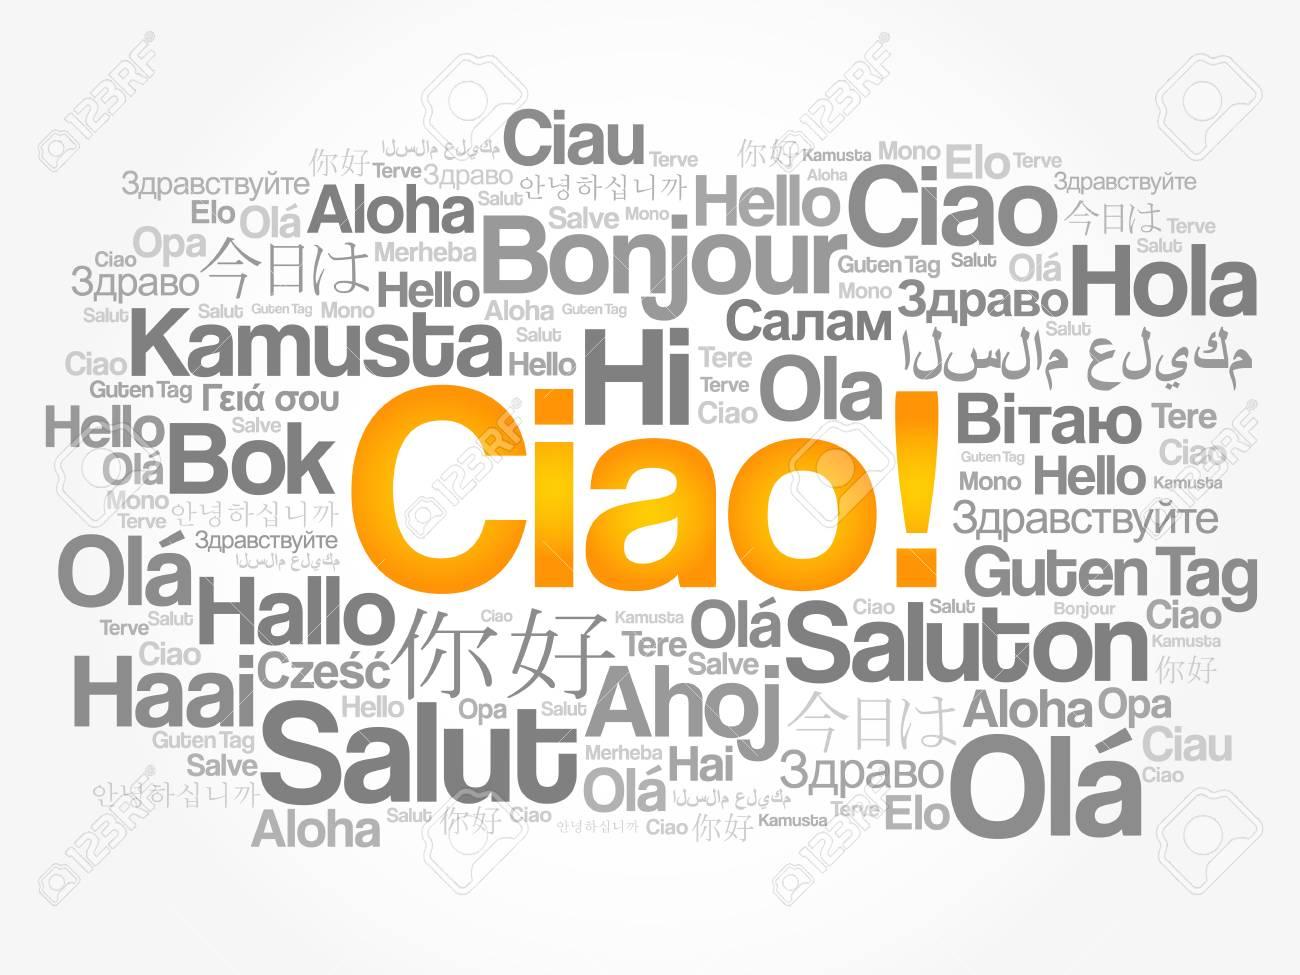 Ciao hello greeting in italian word cloud in different languages ciao hello greeting in italian word cloud in different languages of the world m4hsunfo